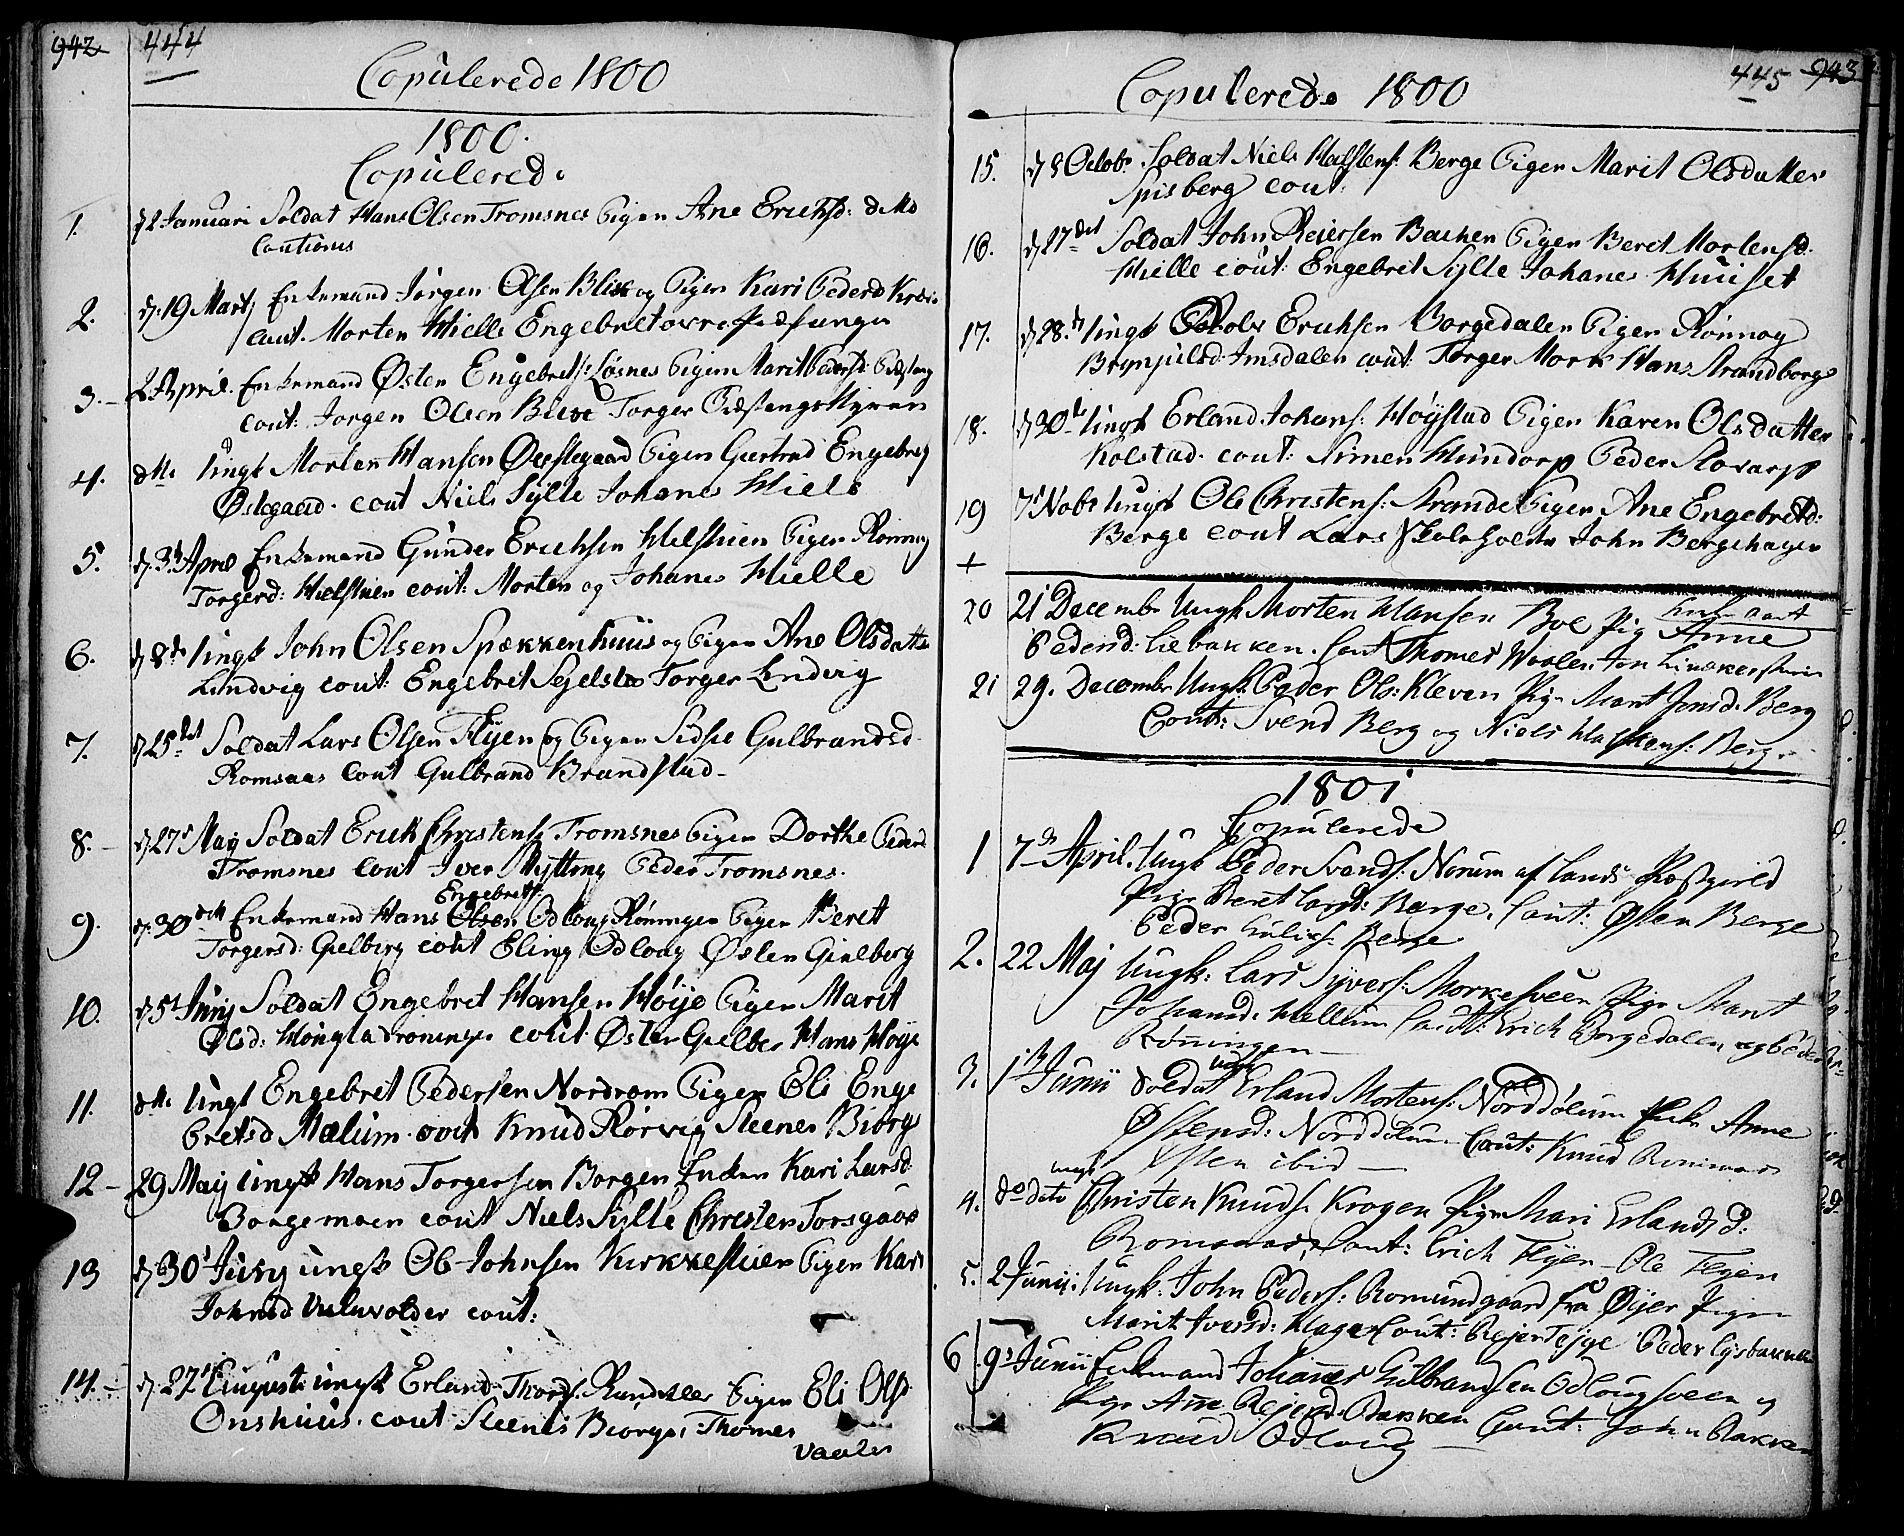 SAH, Ringebu prestekontor, Ministerialbok nr. 3, 1781-1820, s. 444-445